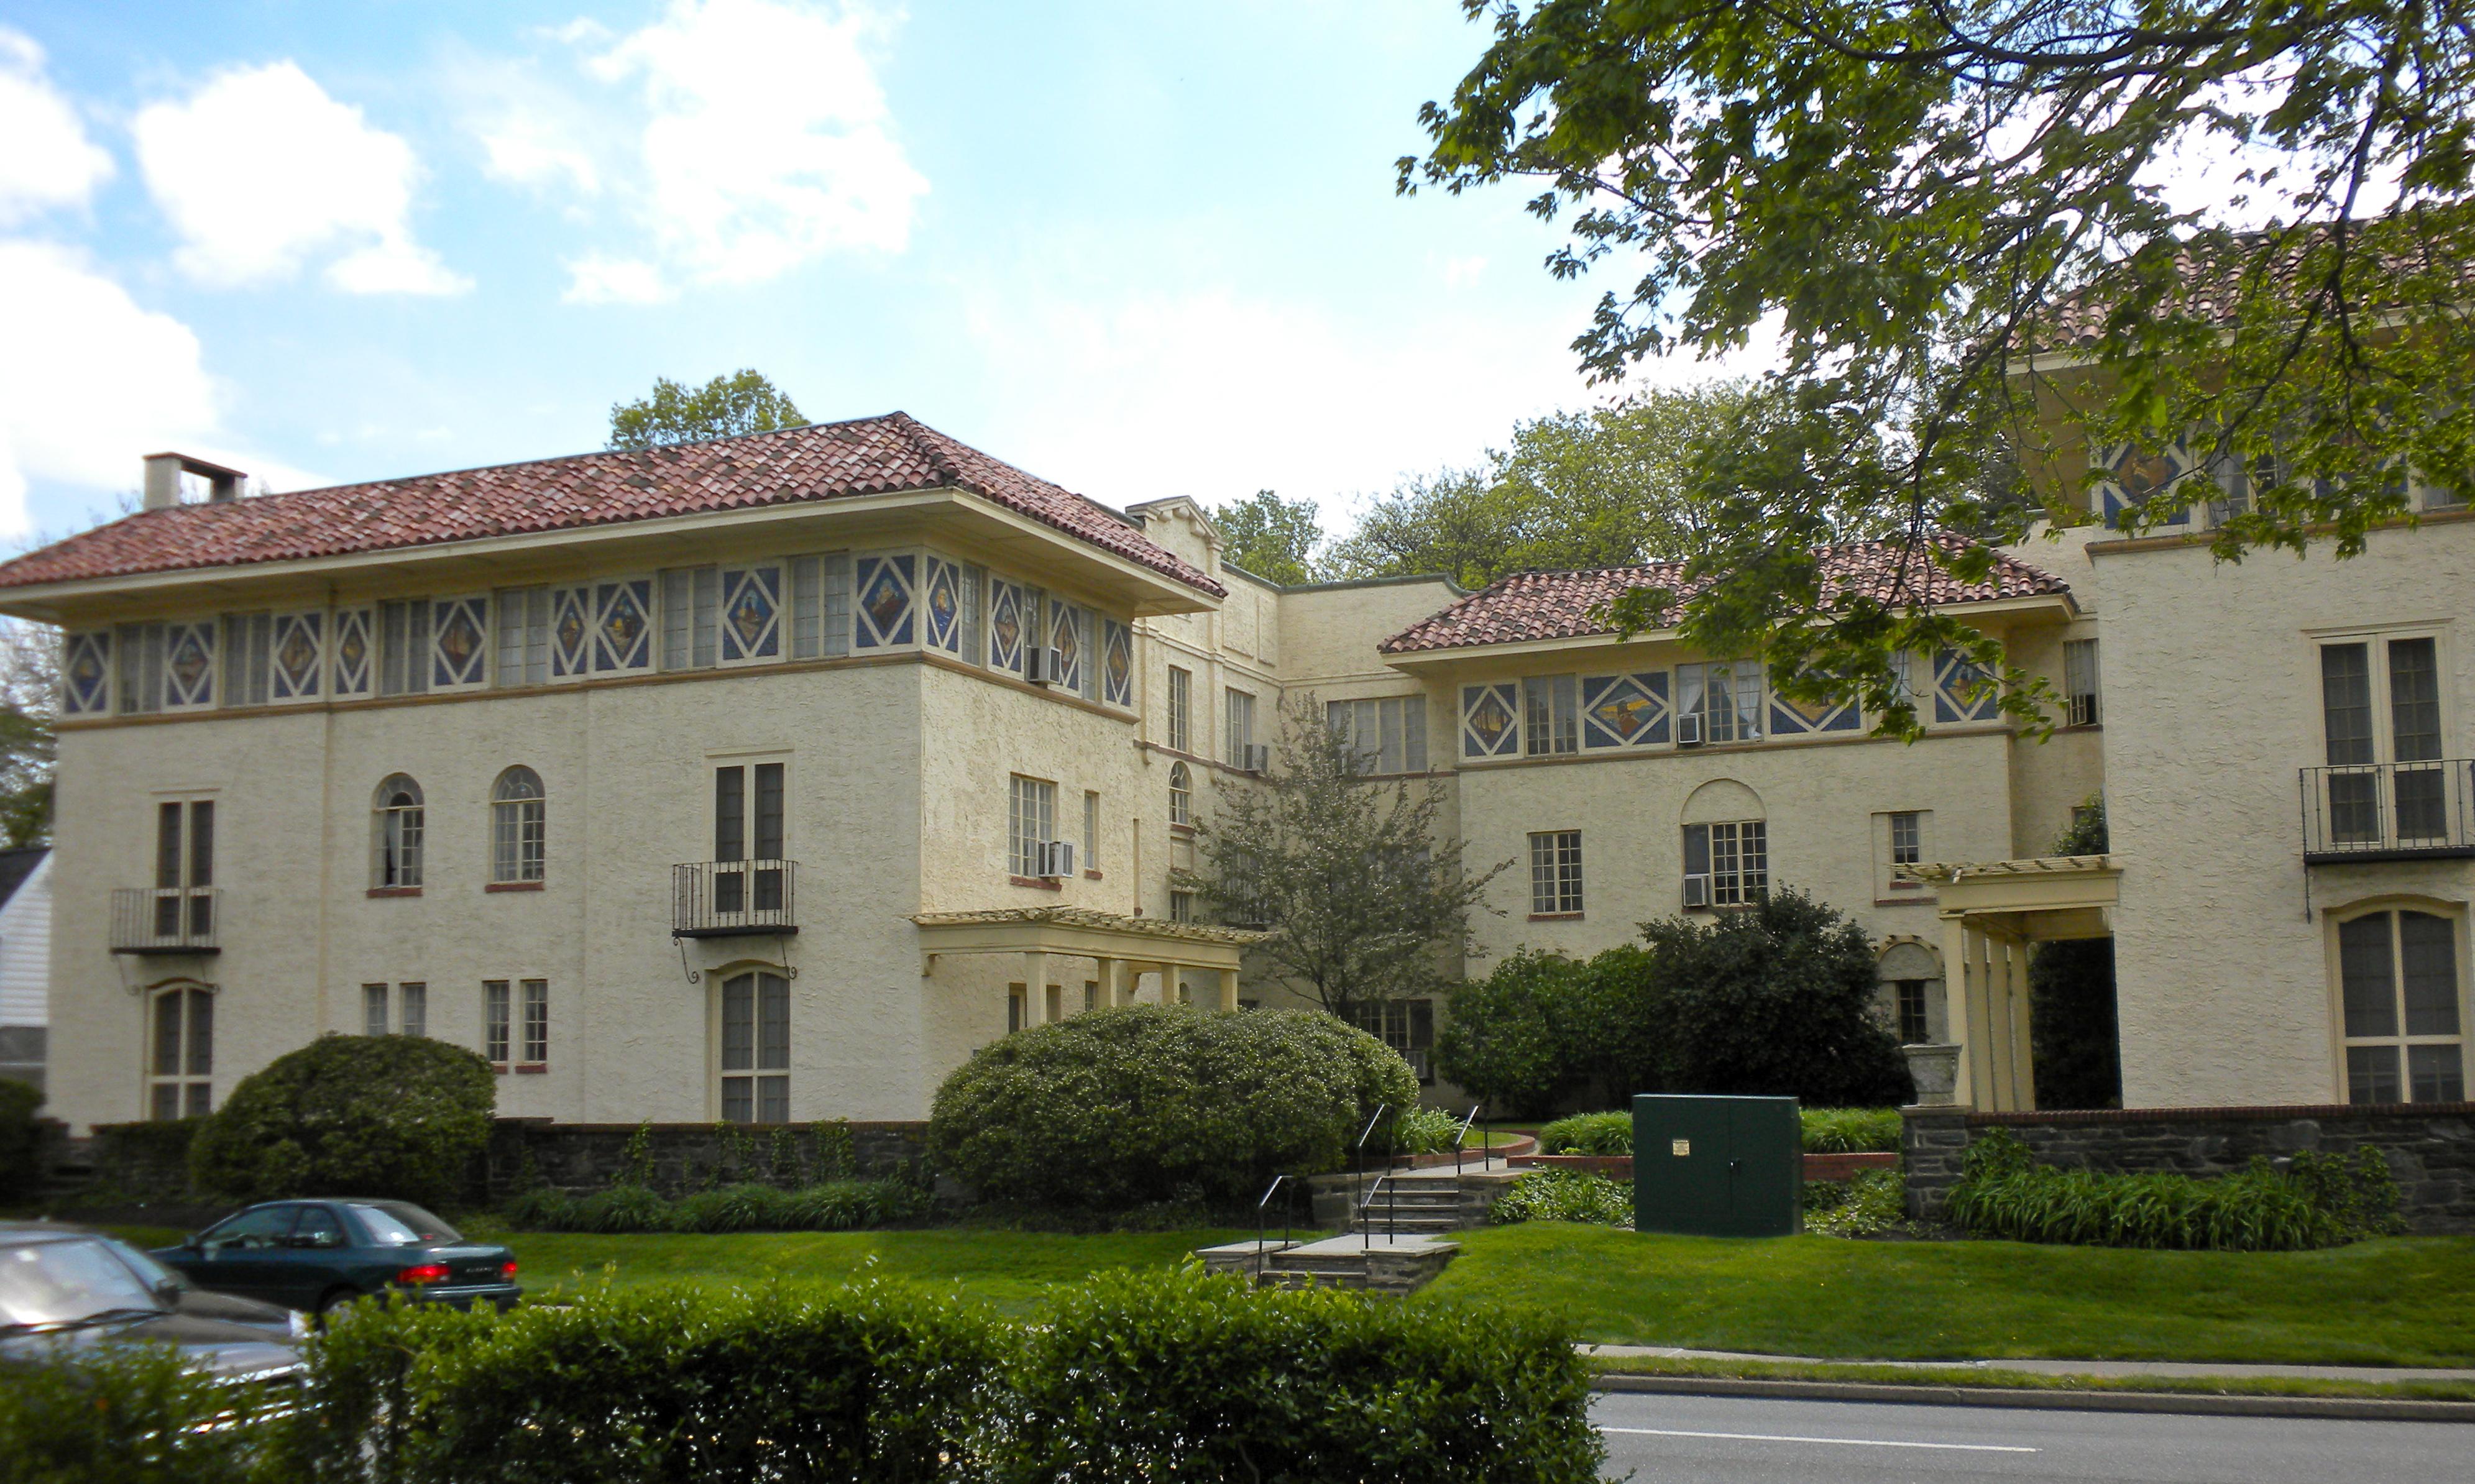 File:Whitehall PA apartments NRHP.jpg - Wikipedia, the free ...